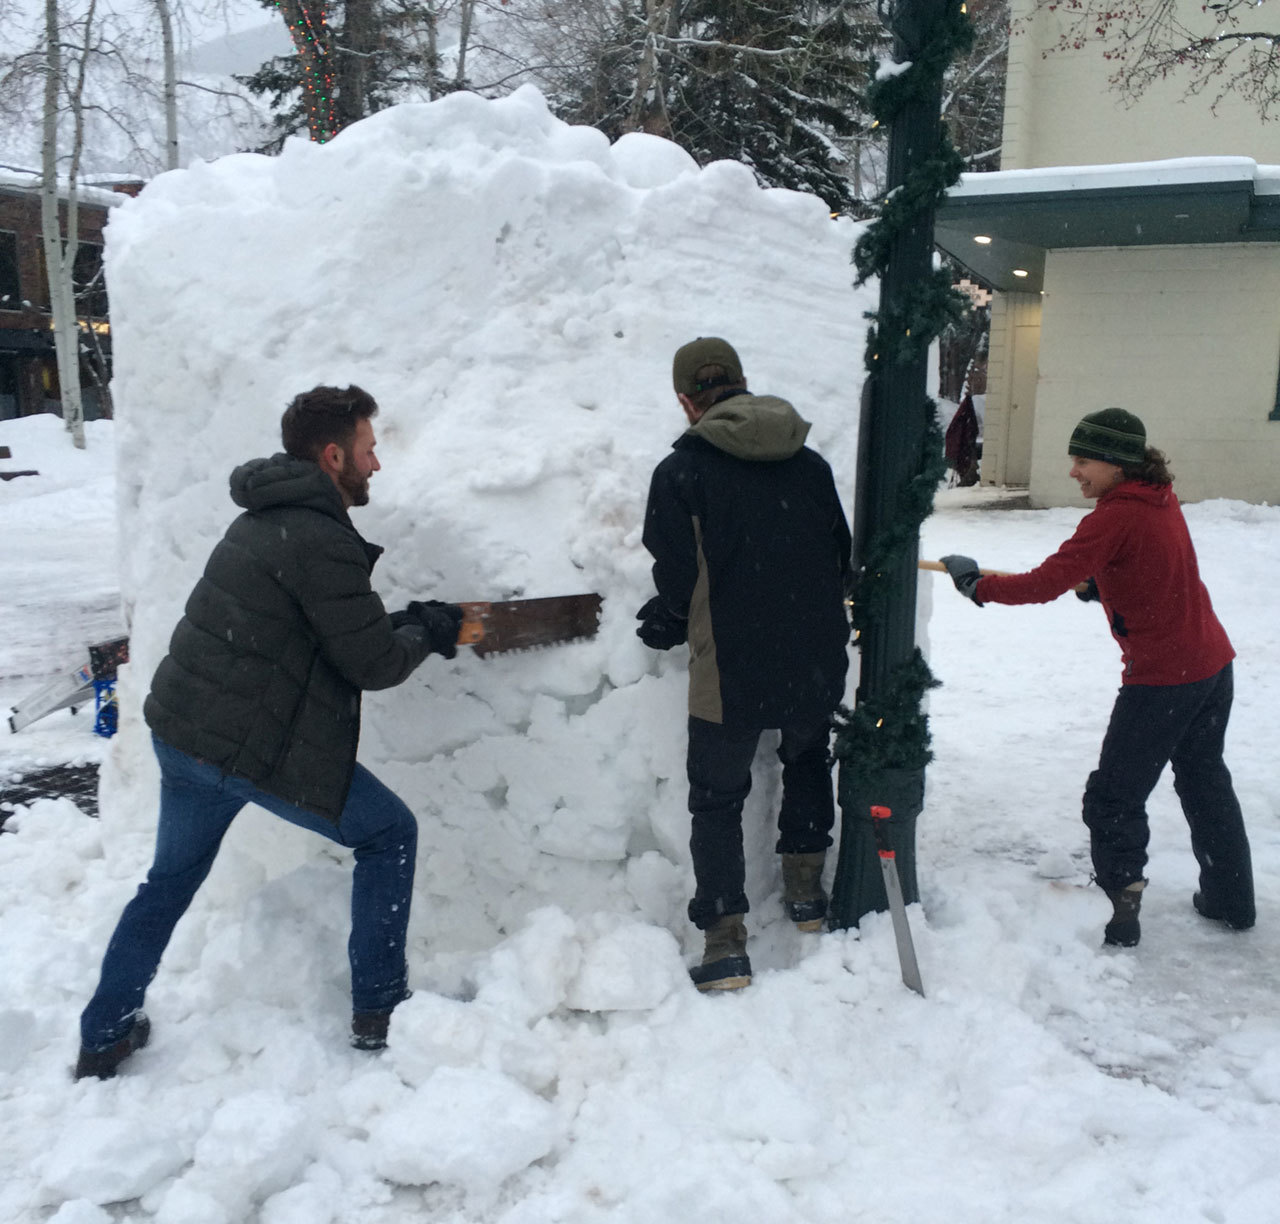 Perspective-Aspen-wintersculpt-carve.jpg#asset:811